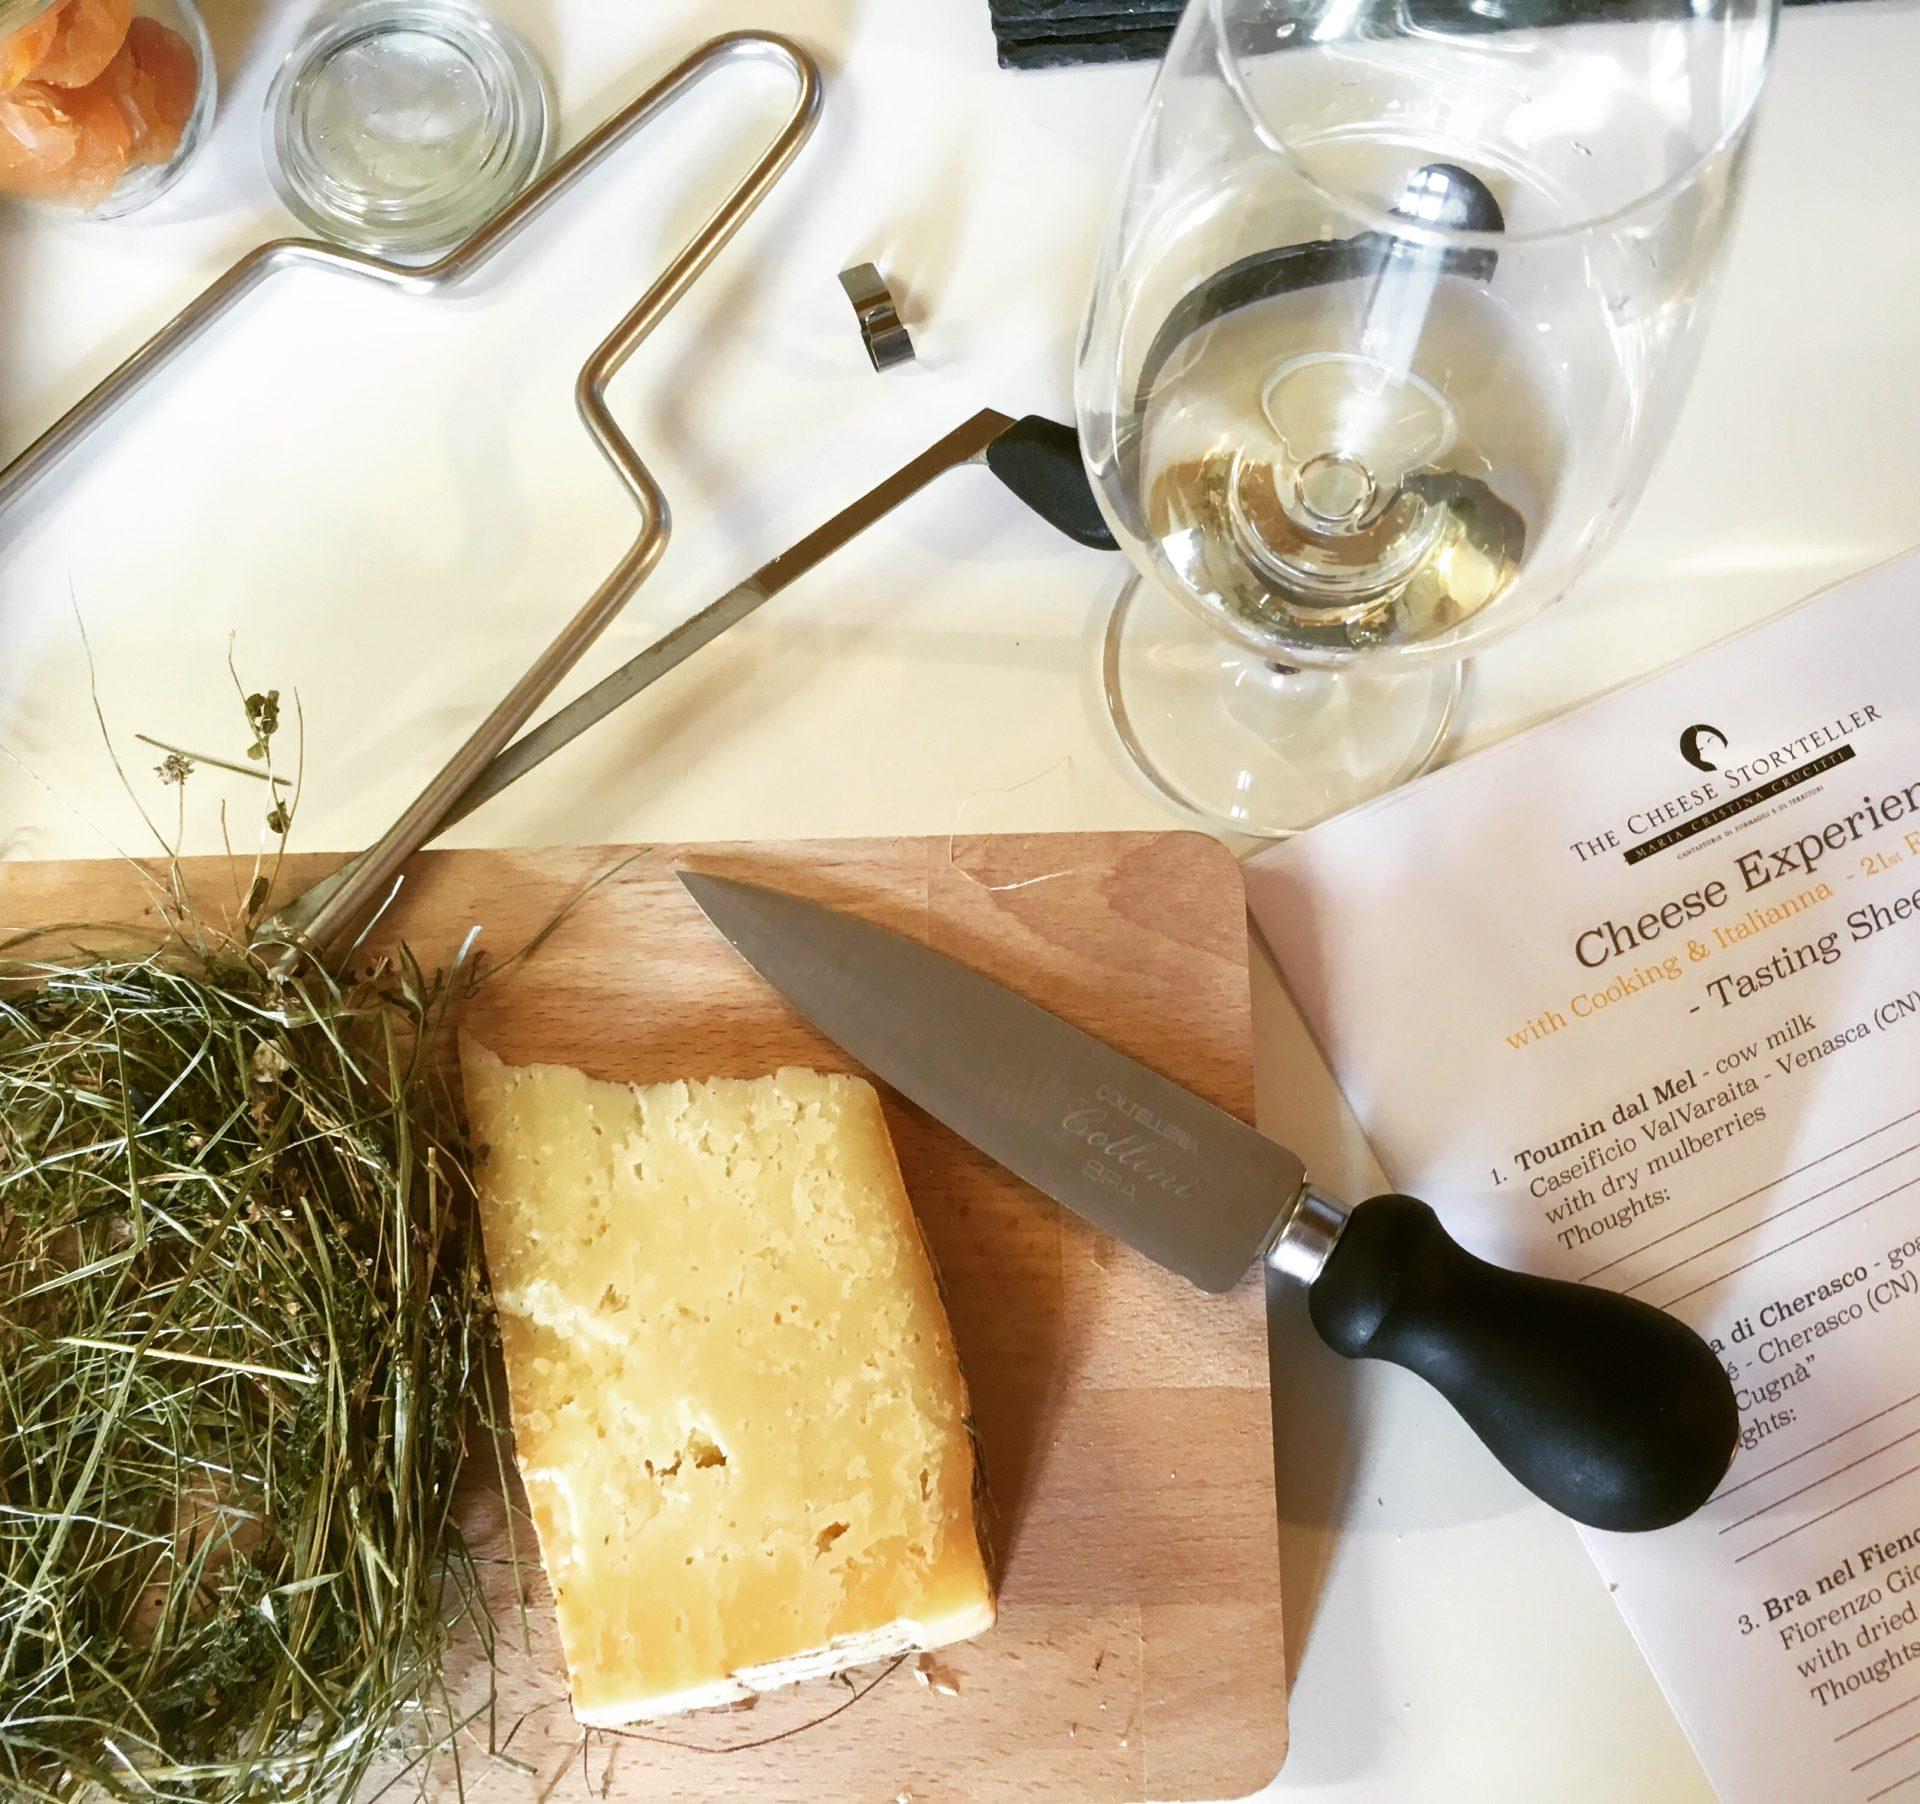 Cheese tour & tasting in Piemonte